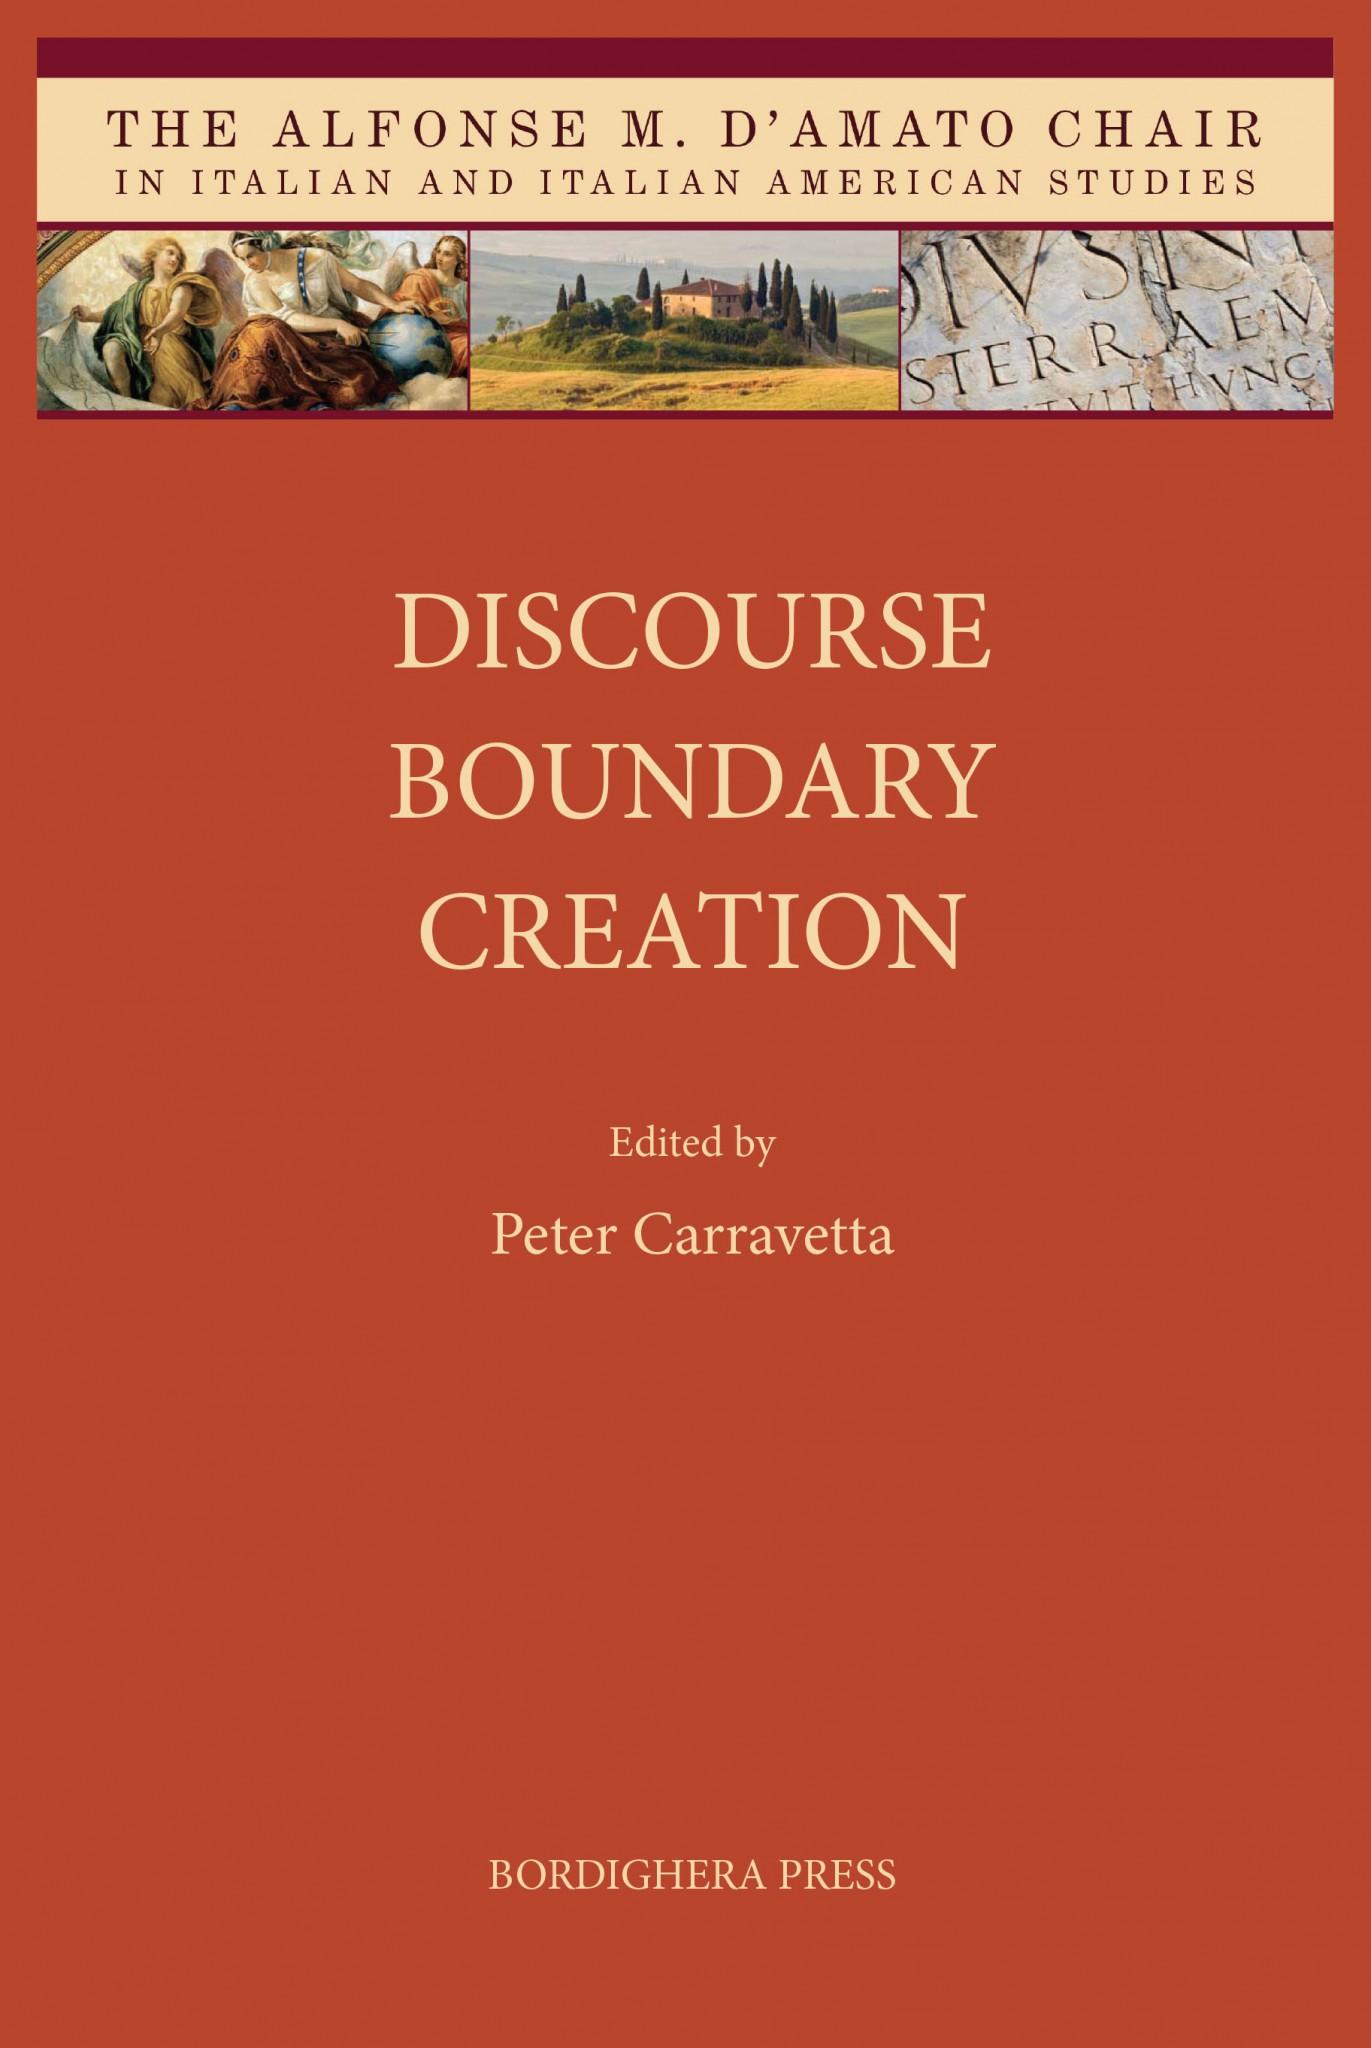 DISCOURSE-BOUNDARY-CREATION